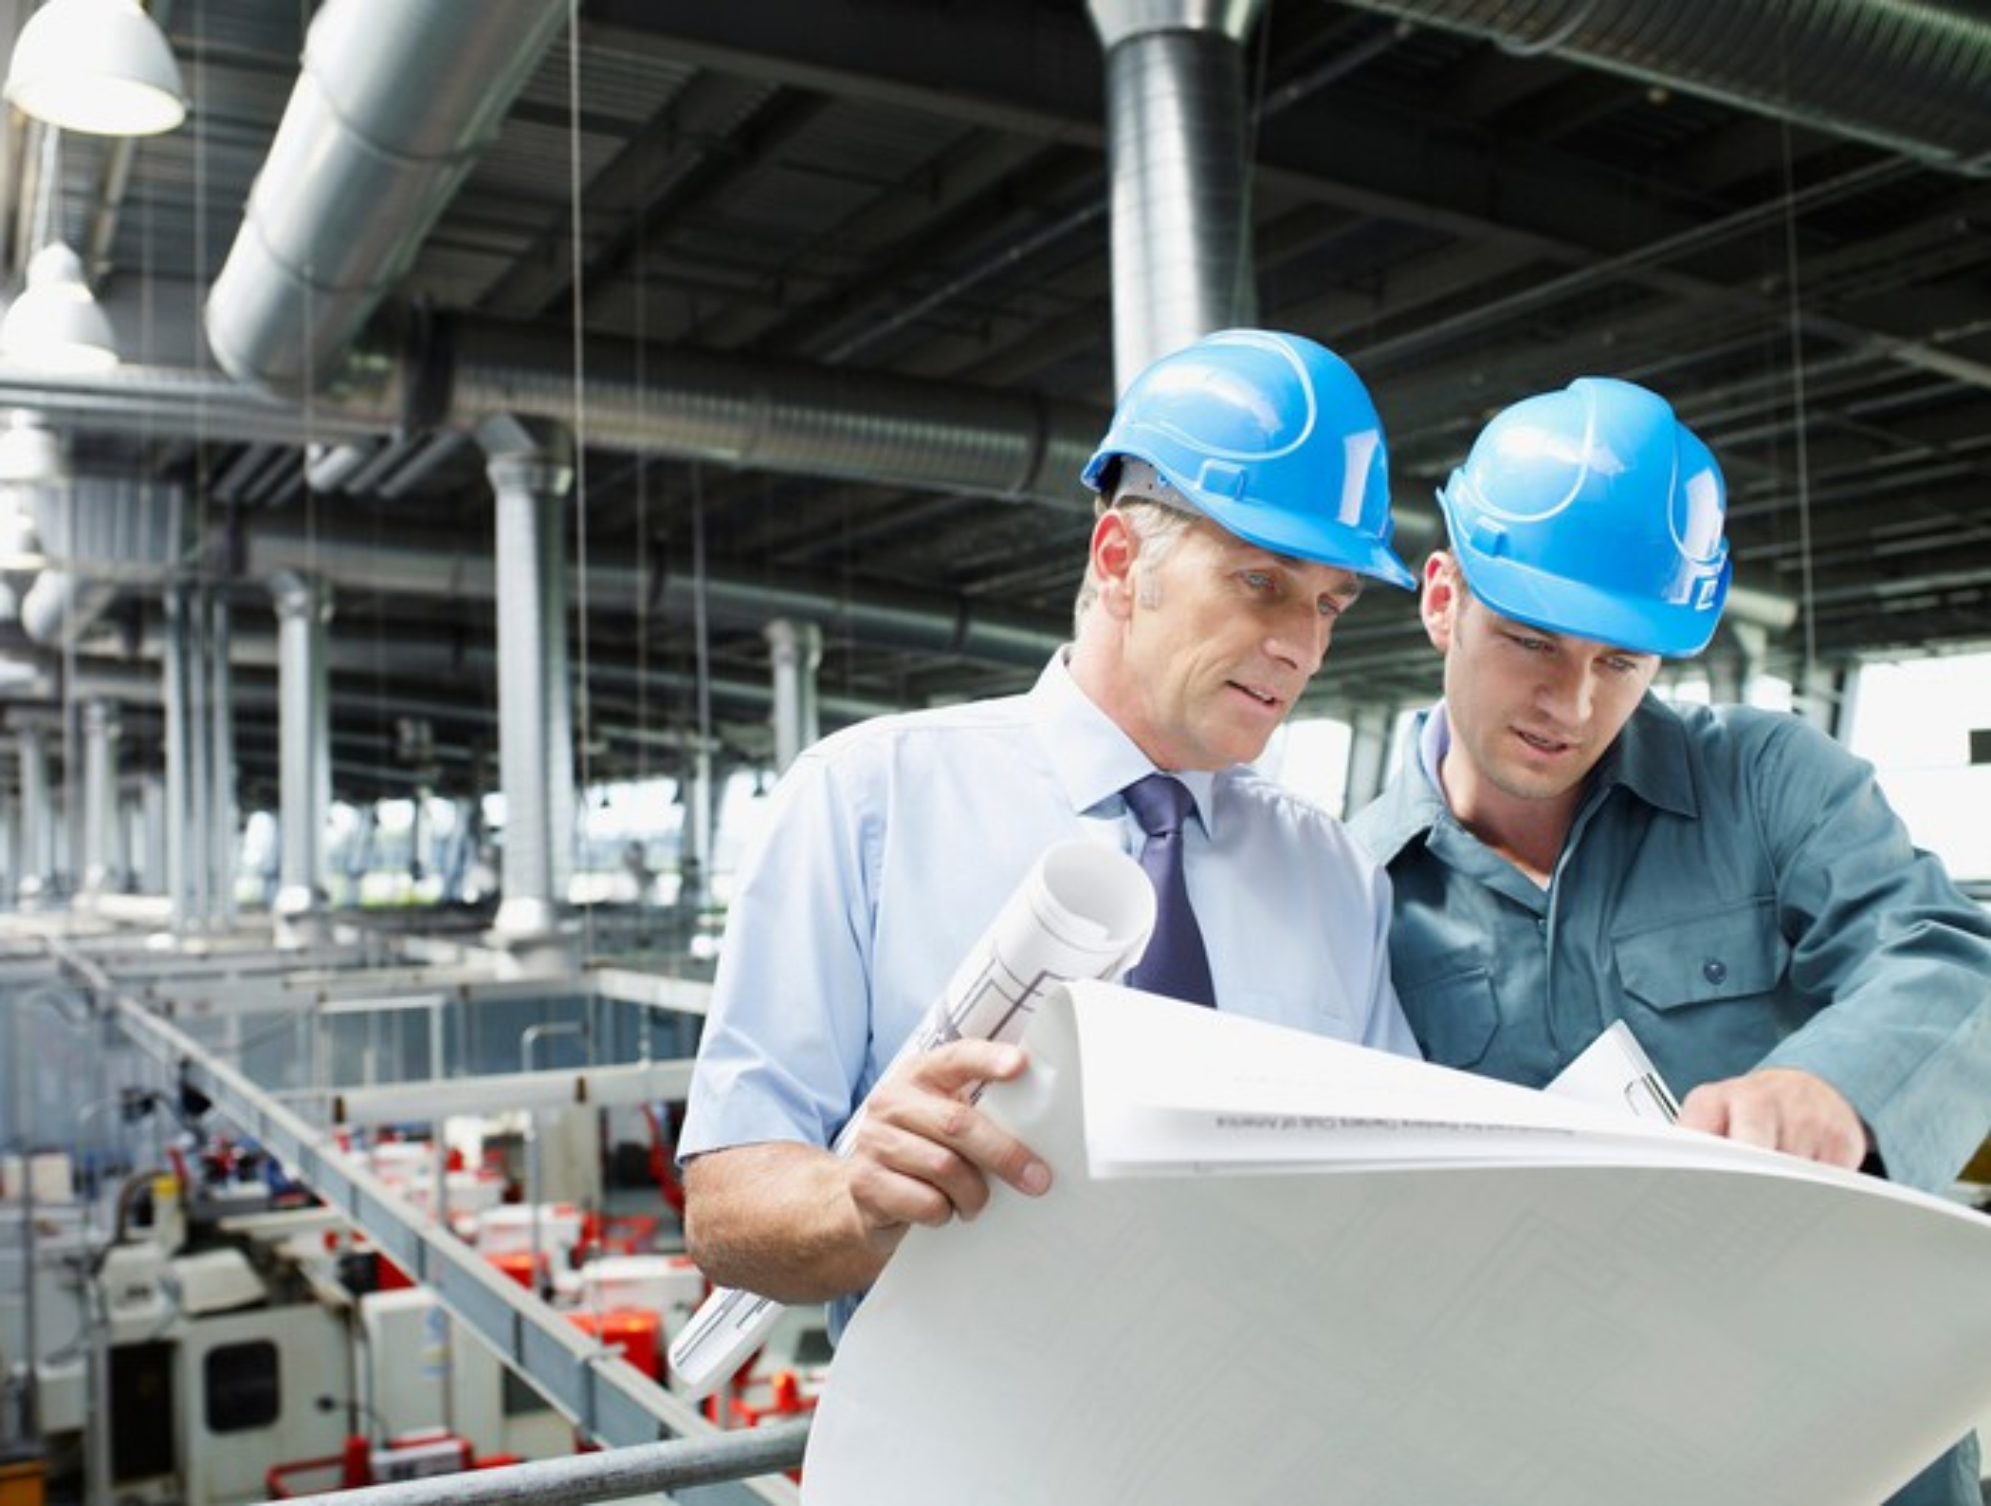 Two men look at blueprints over a factory floor